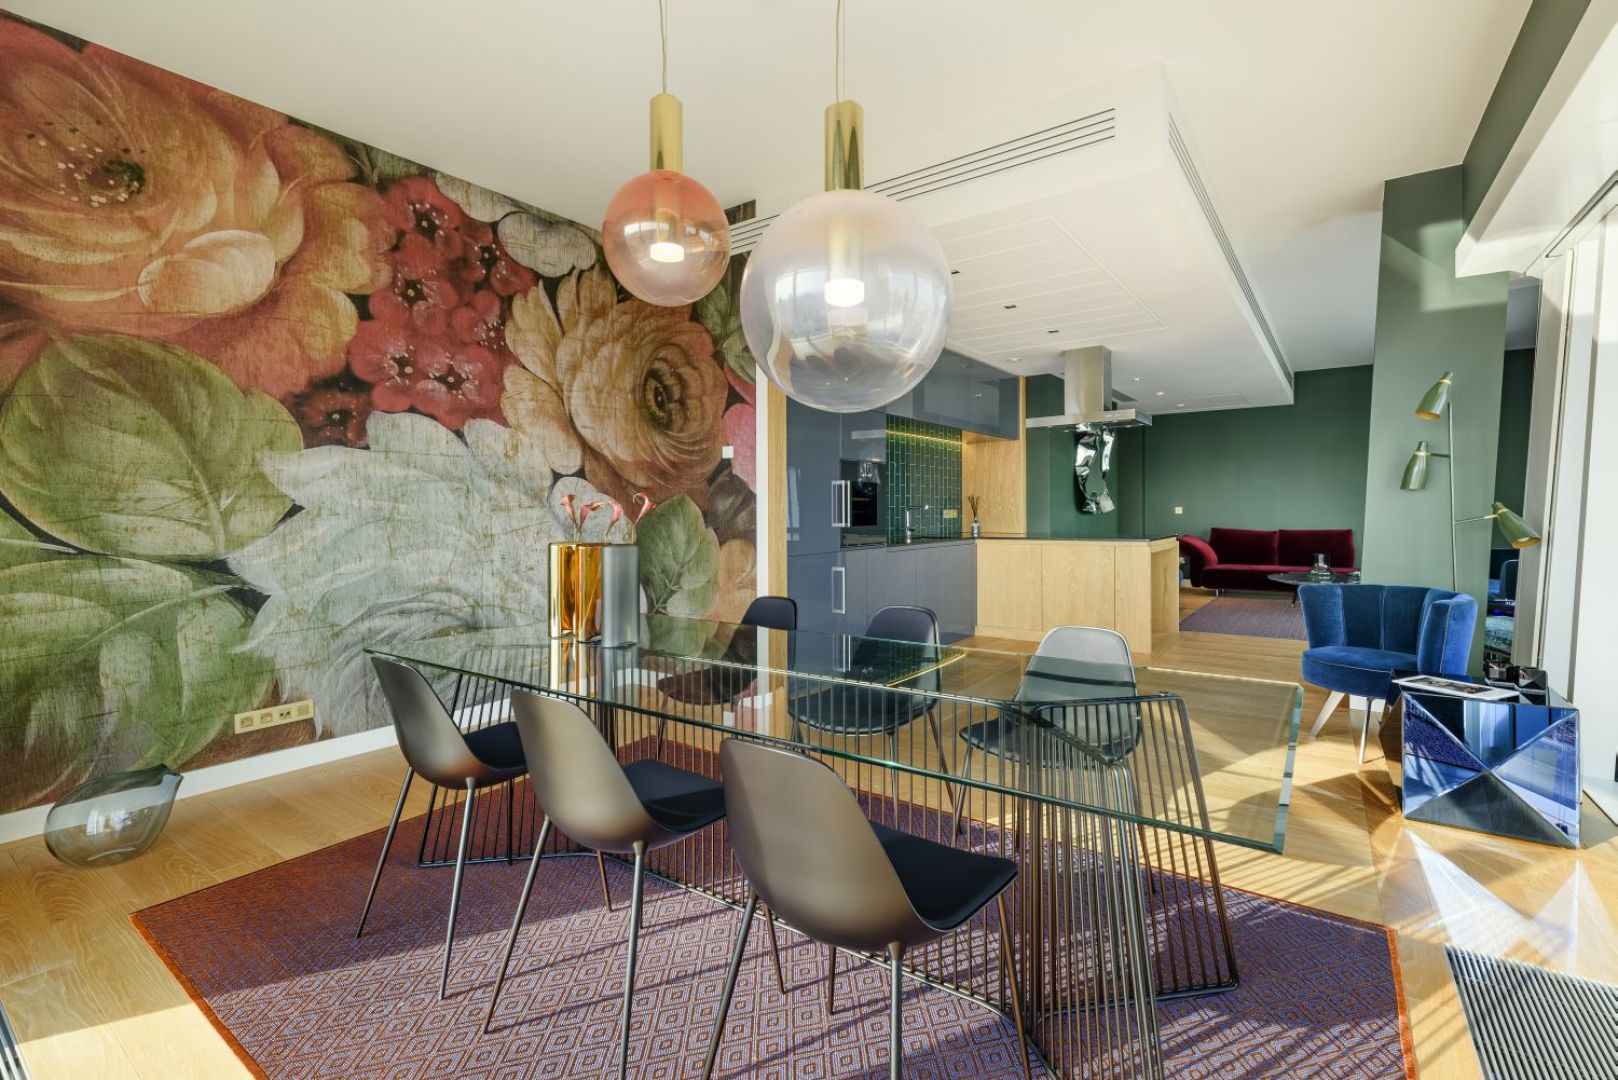 Złota 44 - apartament w stylu włoskim.  Projekt: Ines Lulkowska i Tomasz Tronina. Fot. mat. pras. Galerii Heban